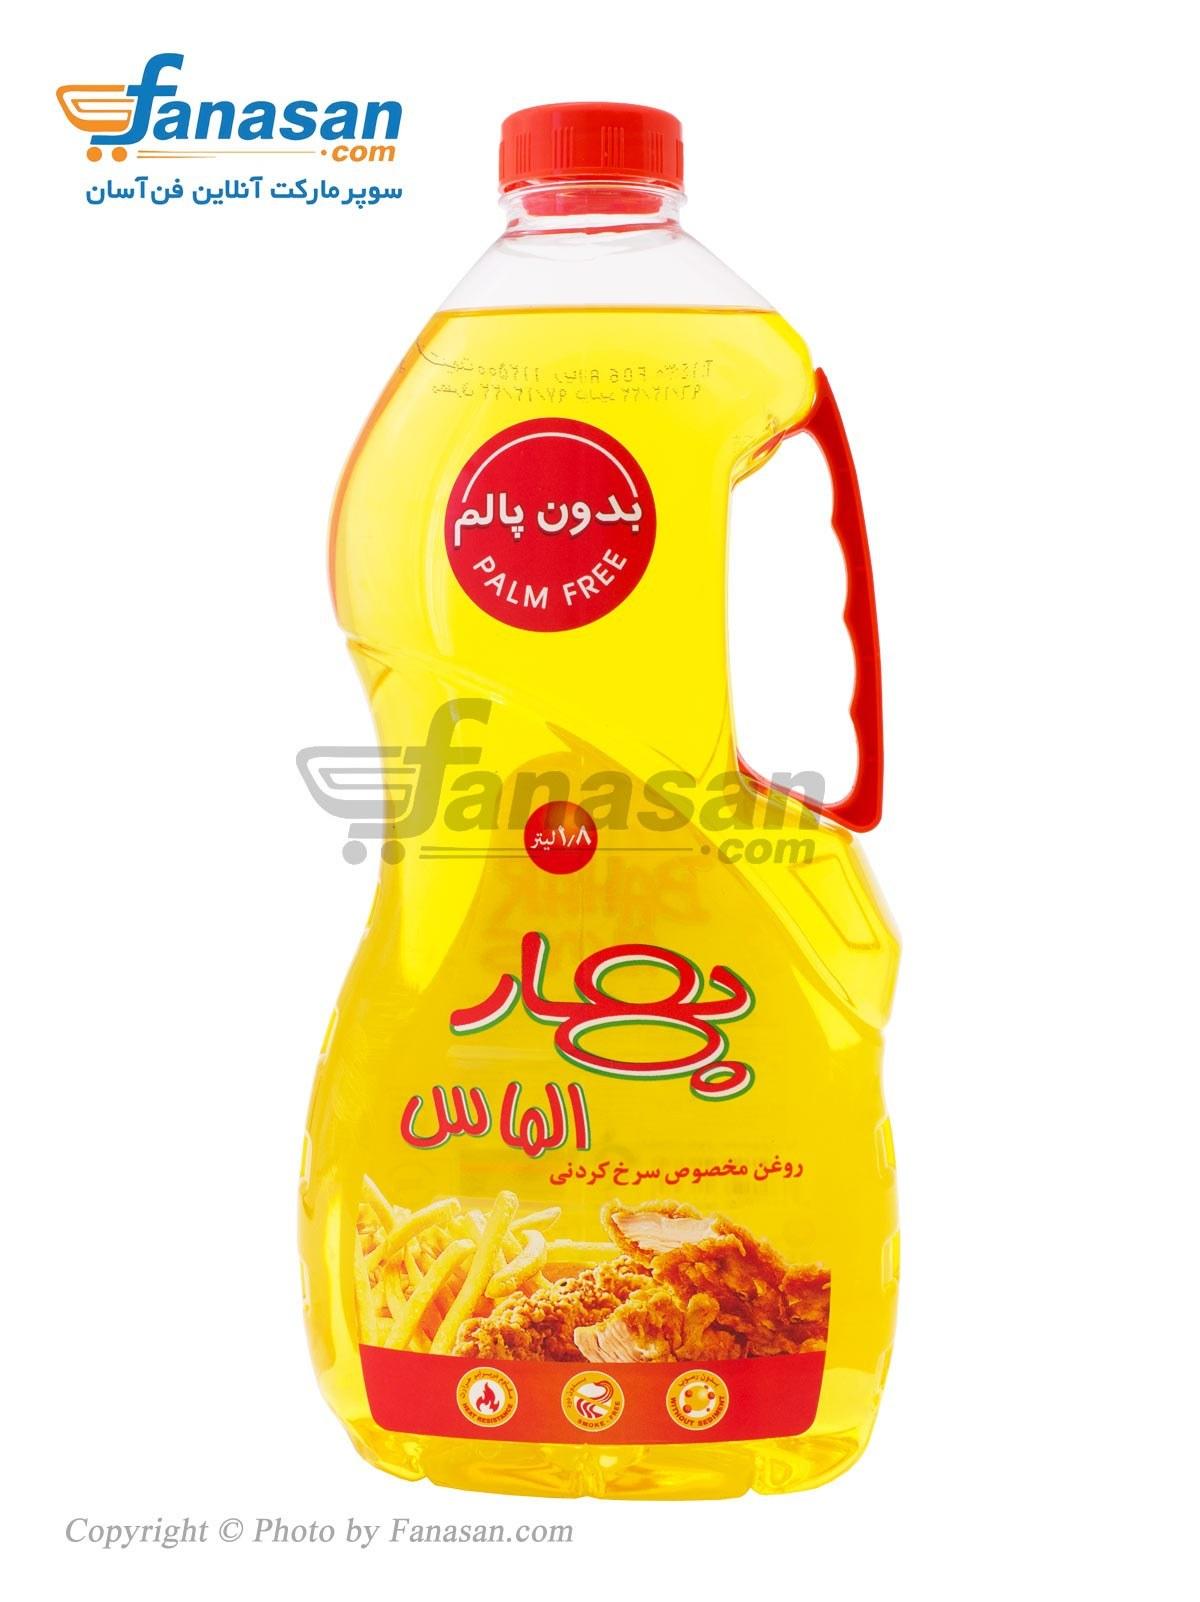 روغن مایع بهار الماس مخصوص سرخ کردنی بدون پالم 1620 گرم   Bahar Almas oil Frying special Without palm 1620 gr